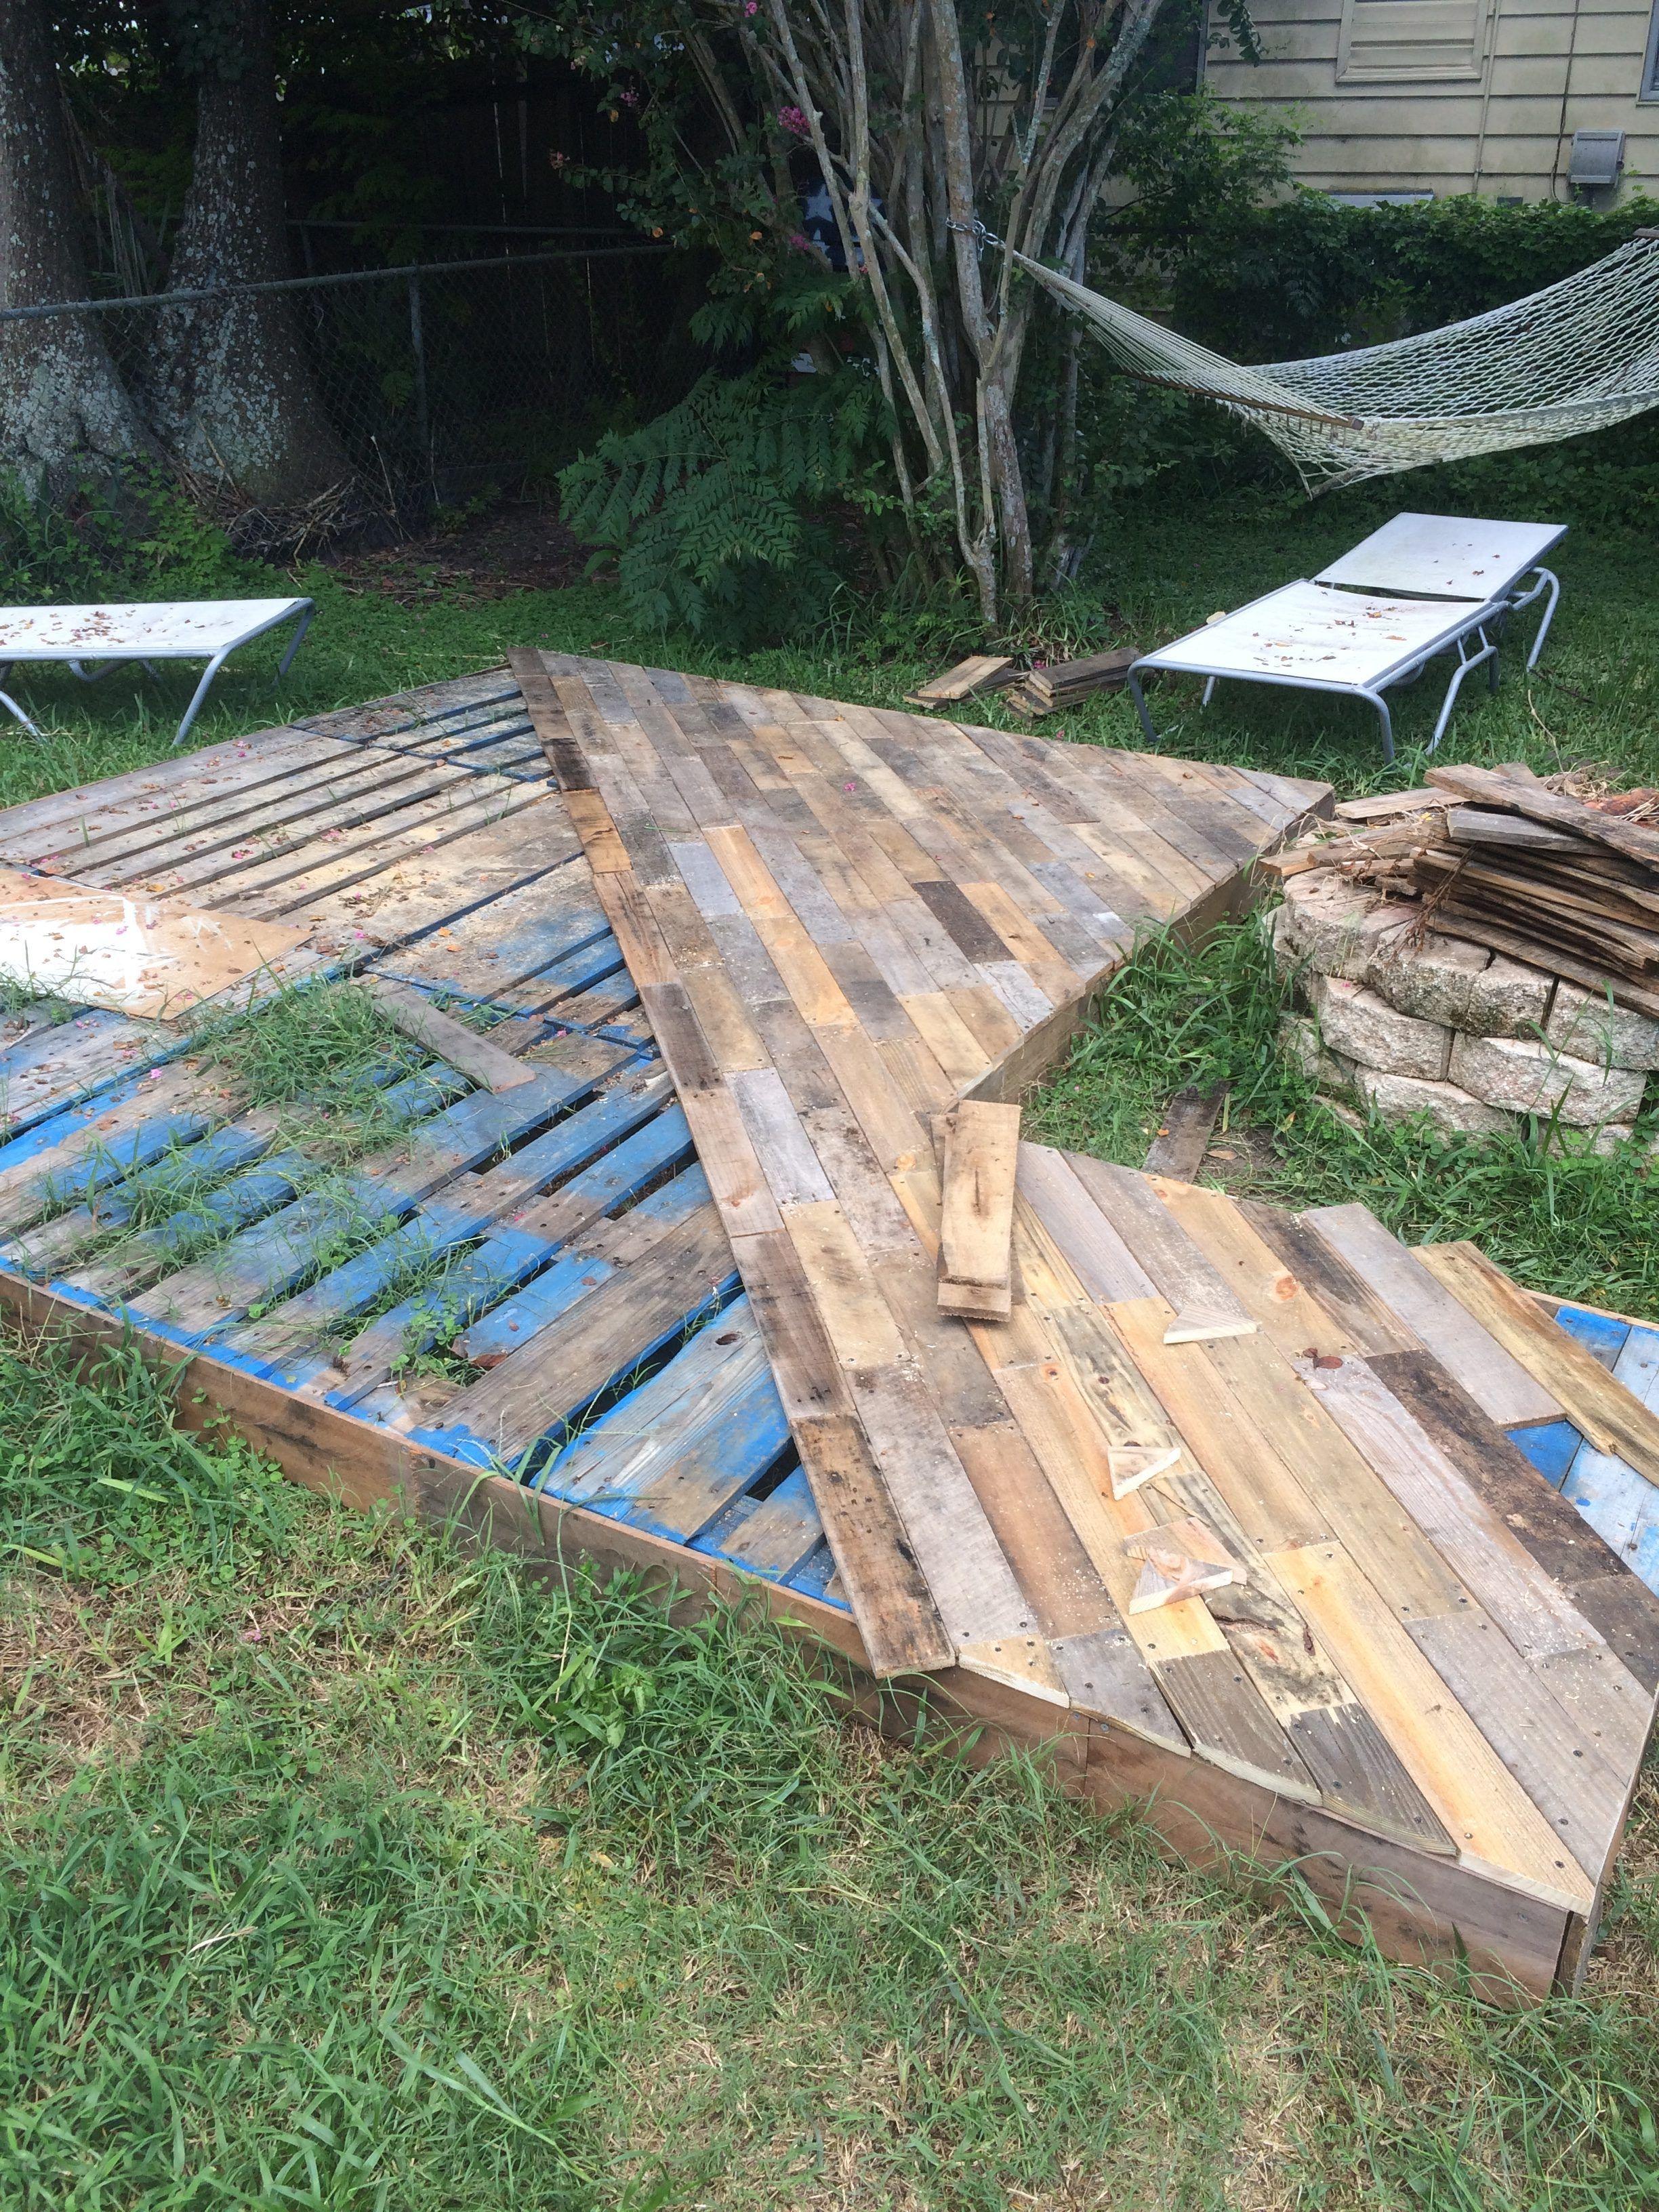 Patio Deck Out Of 25 Wooden Pallets 1001 Pallets Patio Backyard Pallet Patio Decks